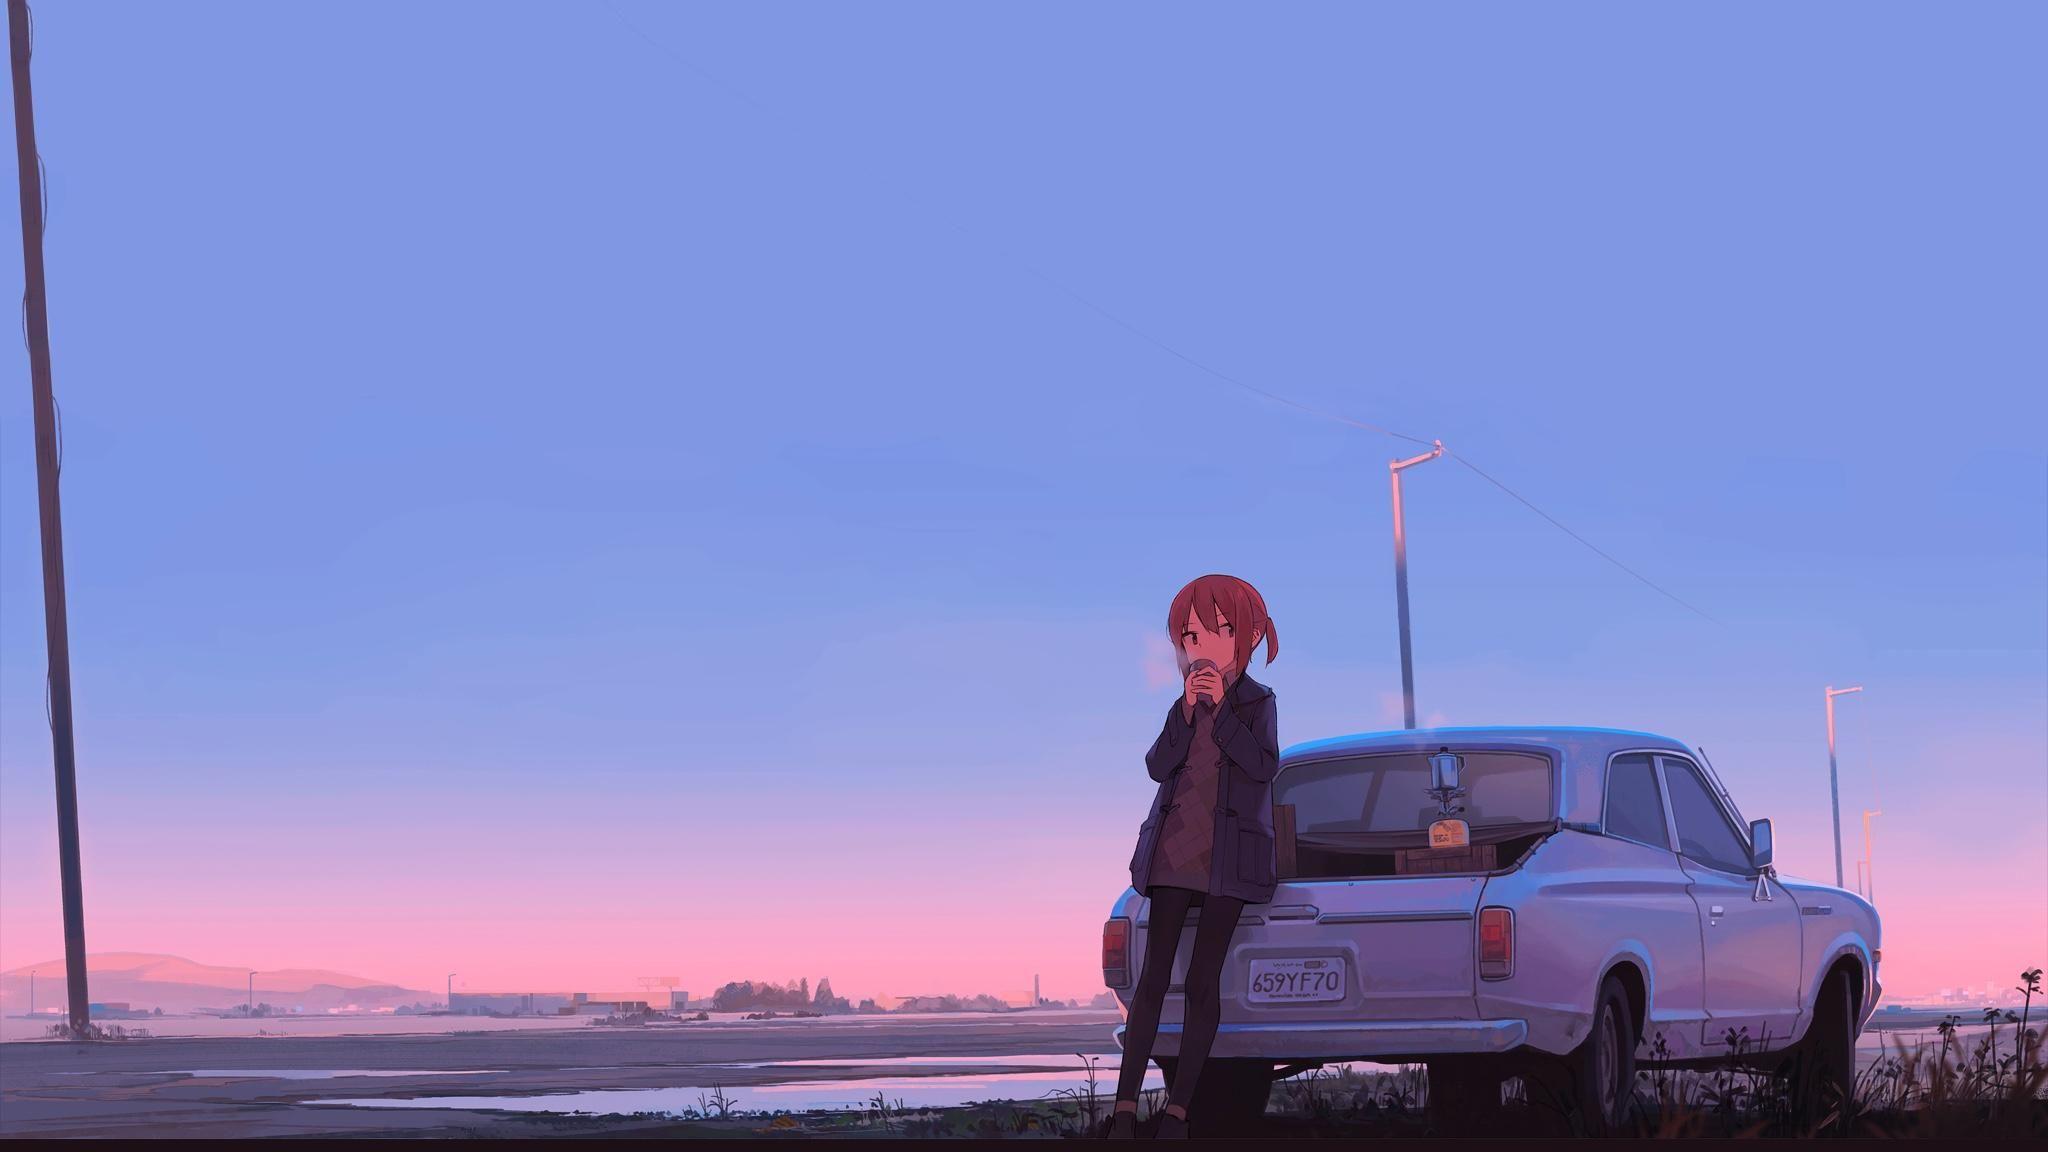 anime sunset and car ((1920x1080) Anime scenery